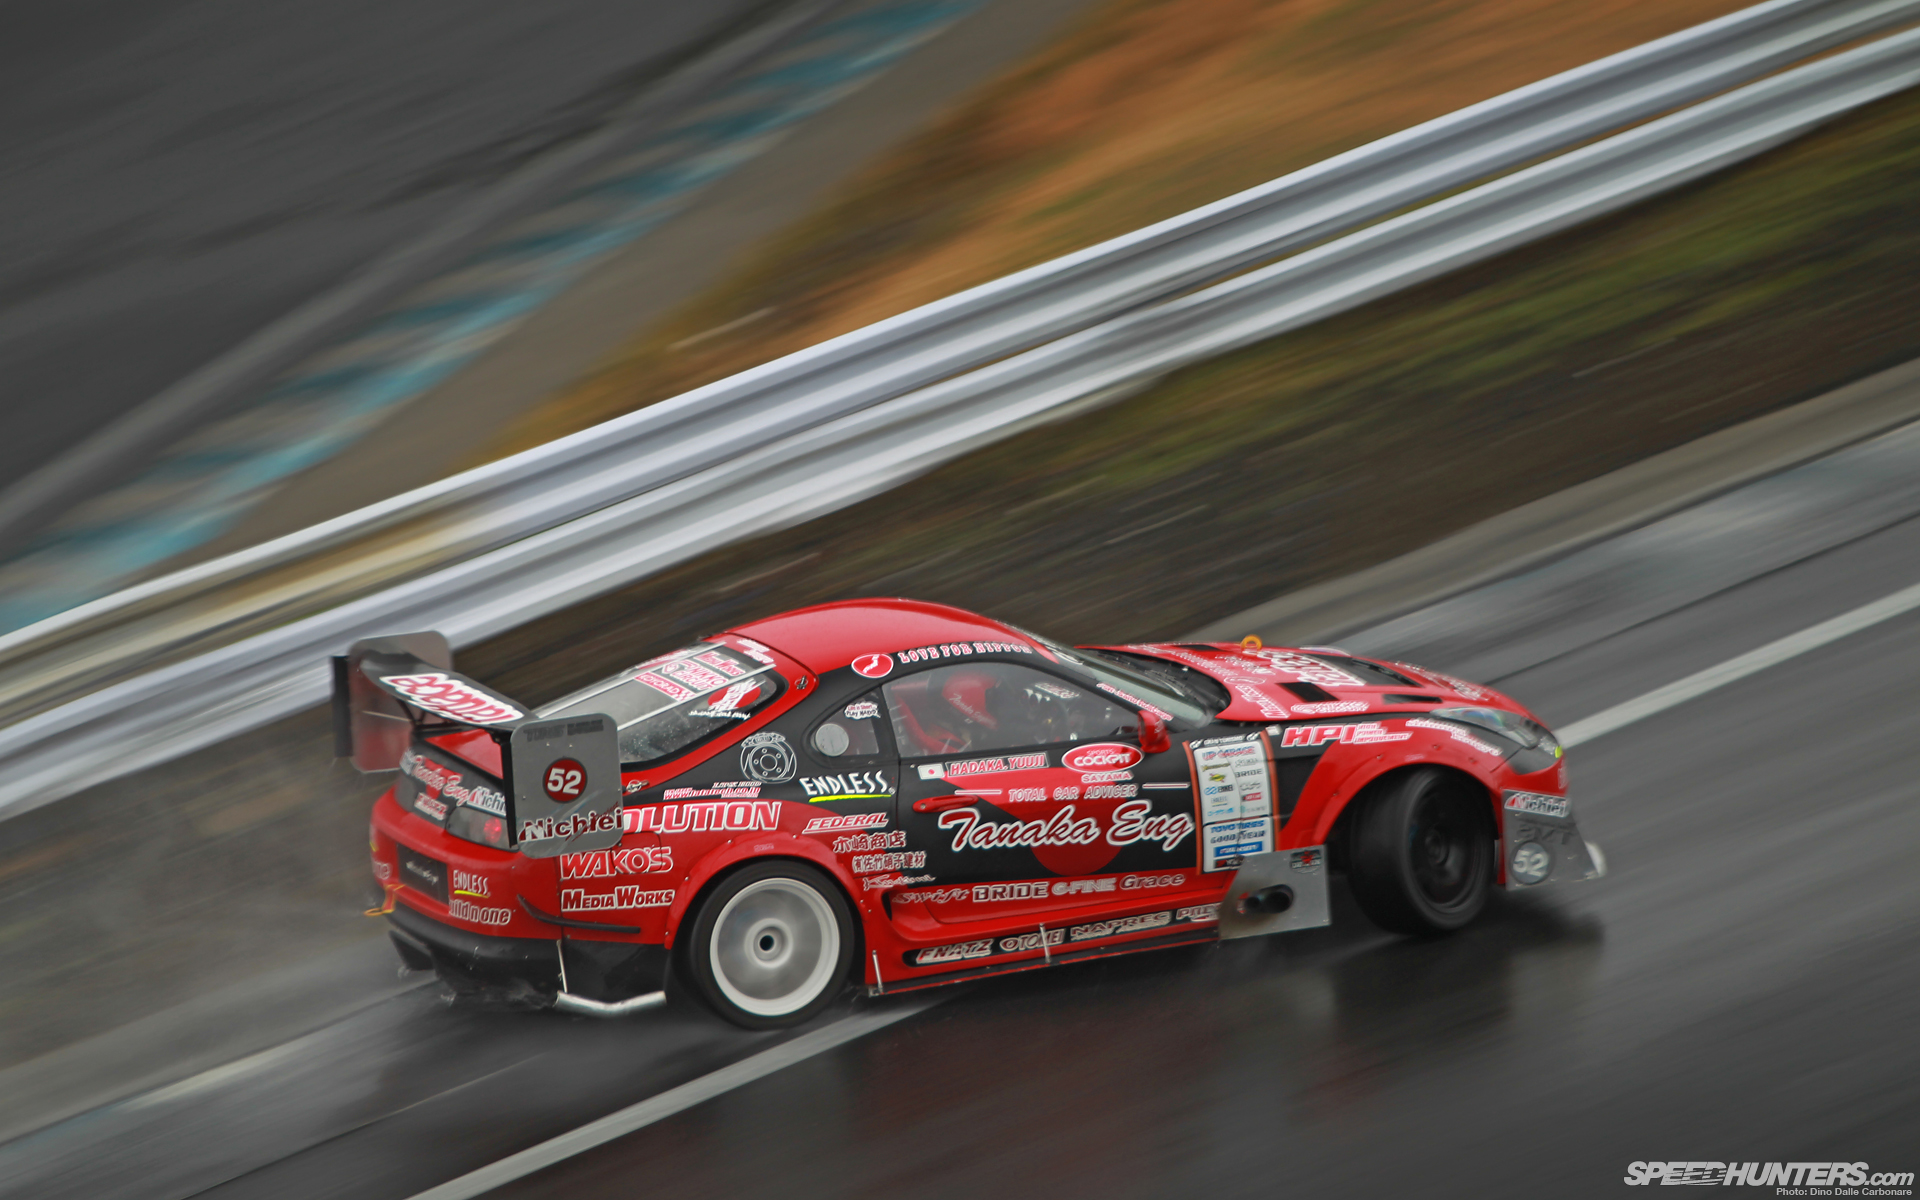 Toyota Supra Drift Motion Blur Wet wallpaper 1920x1200 70842 1920x1200